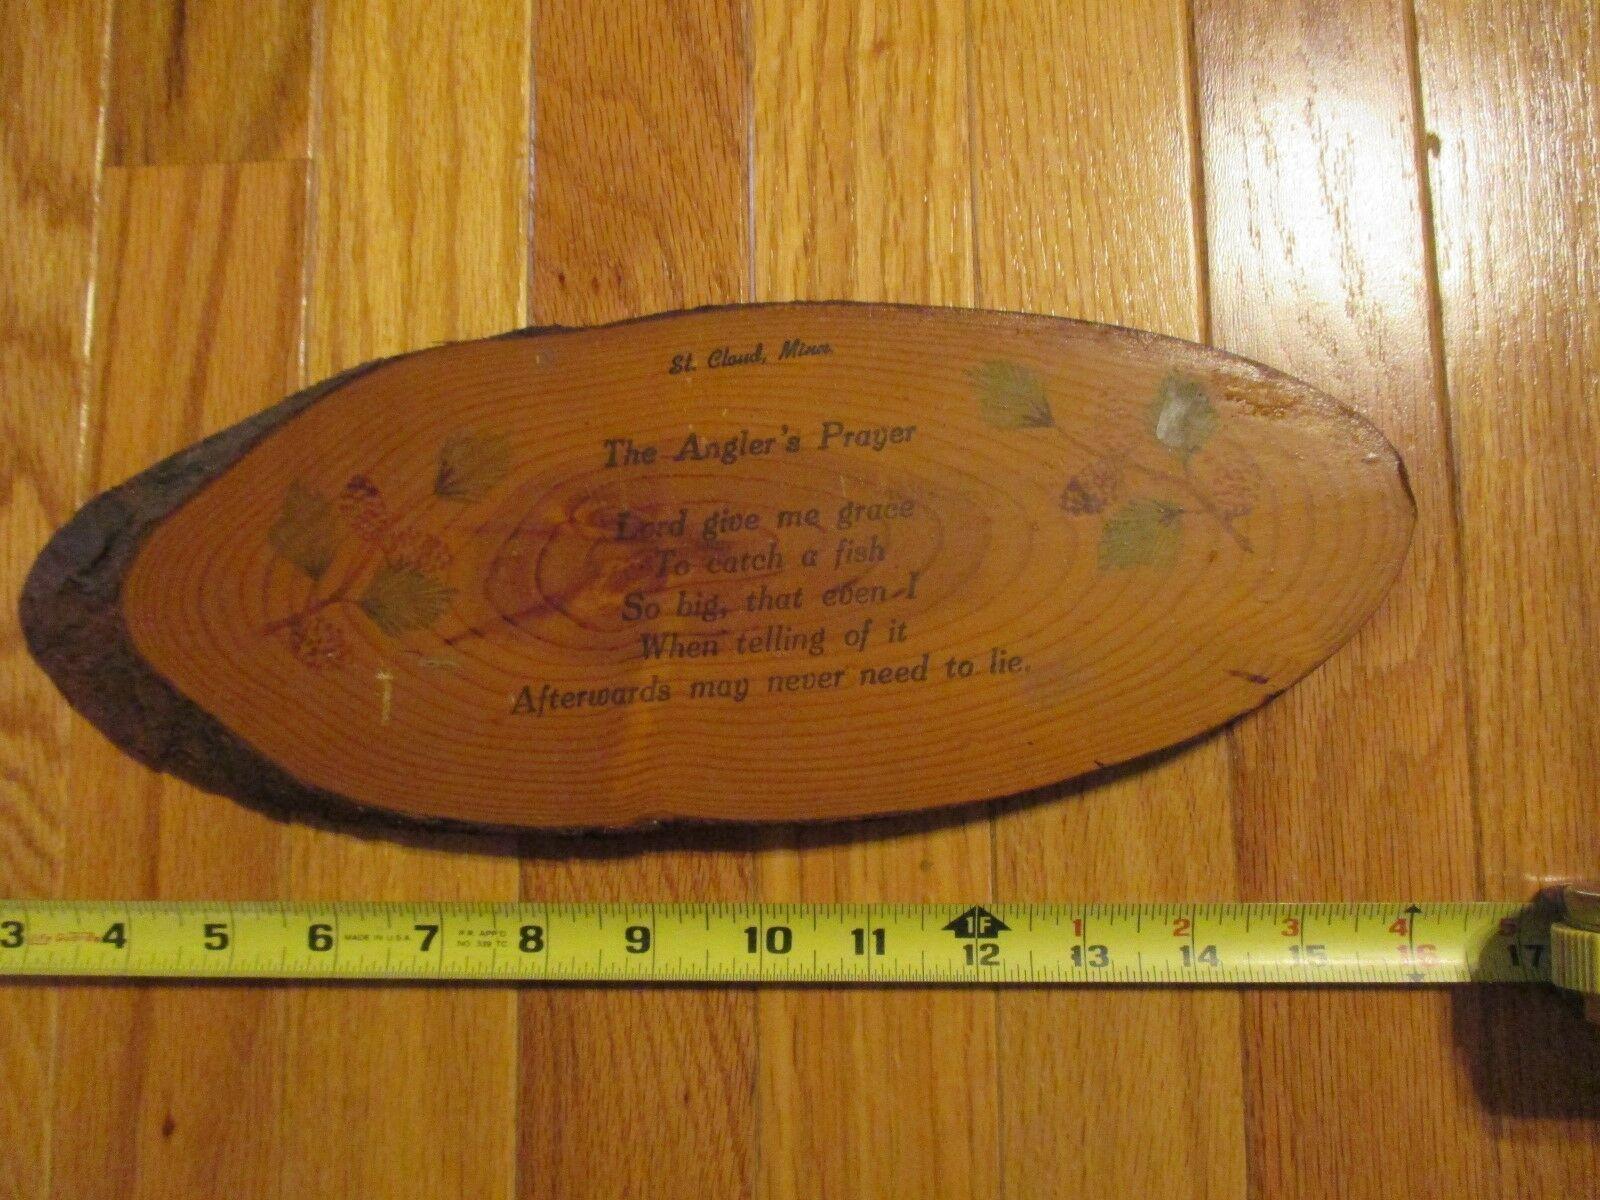 St Cloud Minnesota MN The Anglers Prayer Souvenir piece Wood